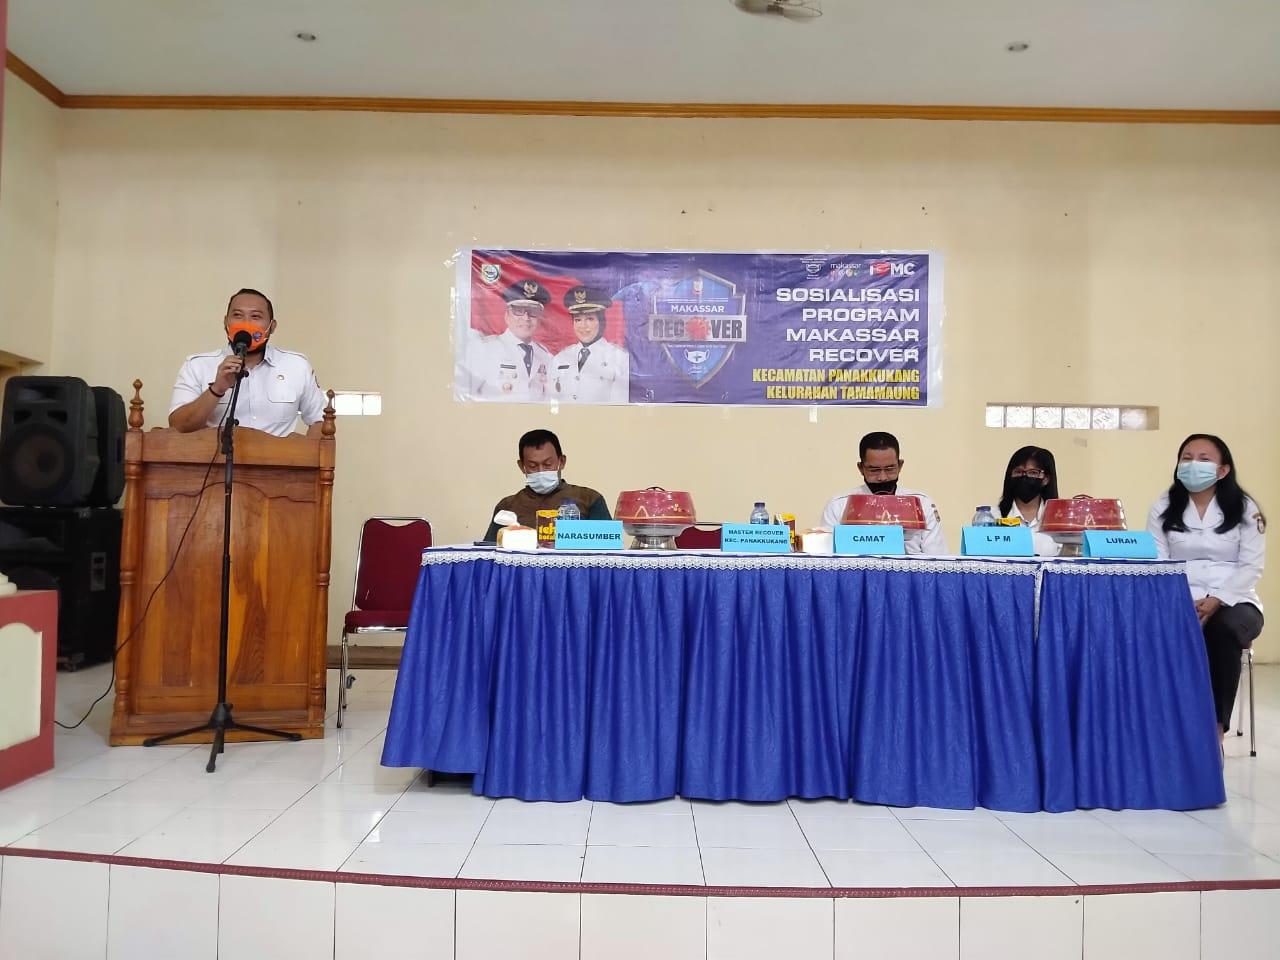 Master Panakkukang Sosialisasikan Makassar Recover di Tamamaung